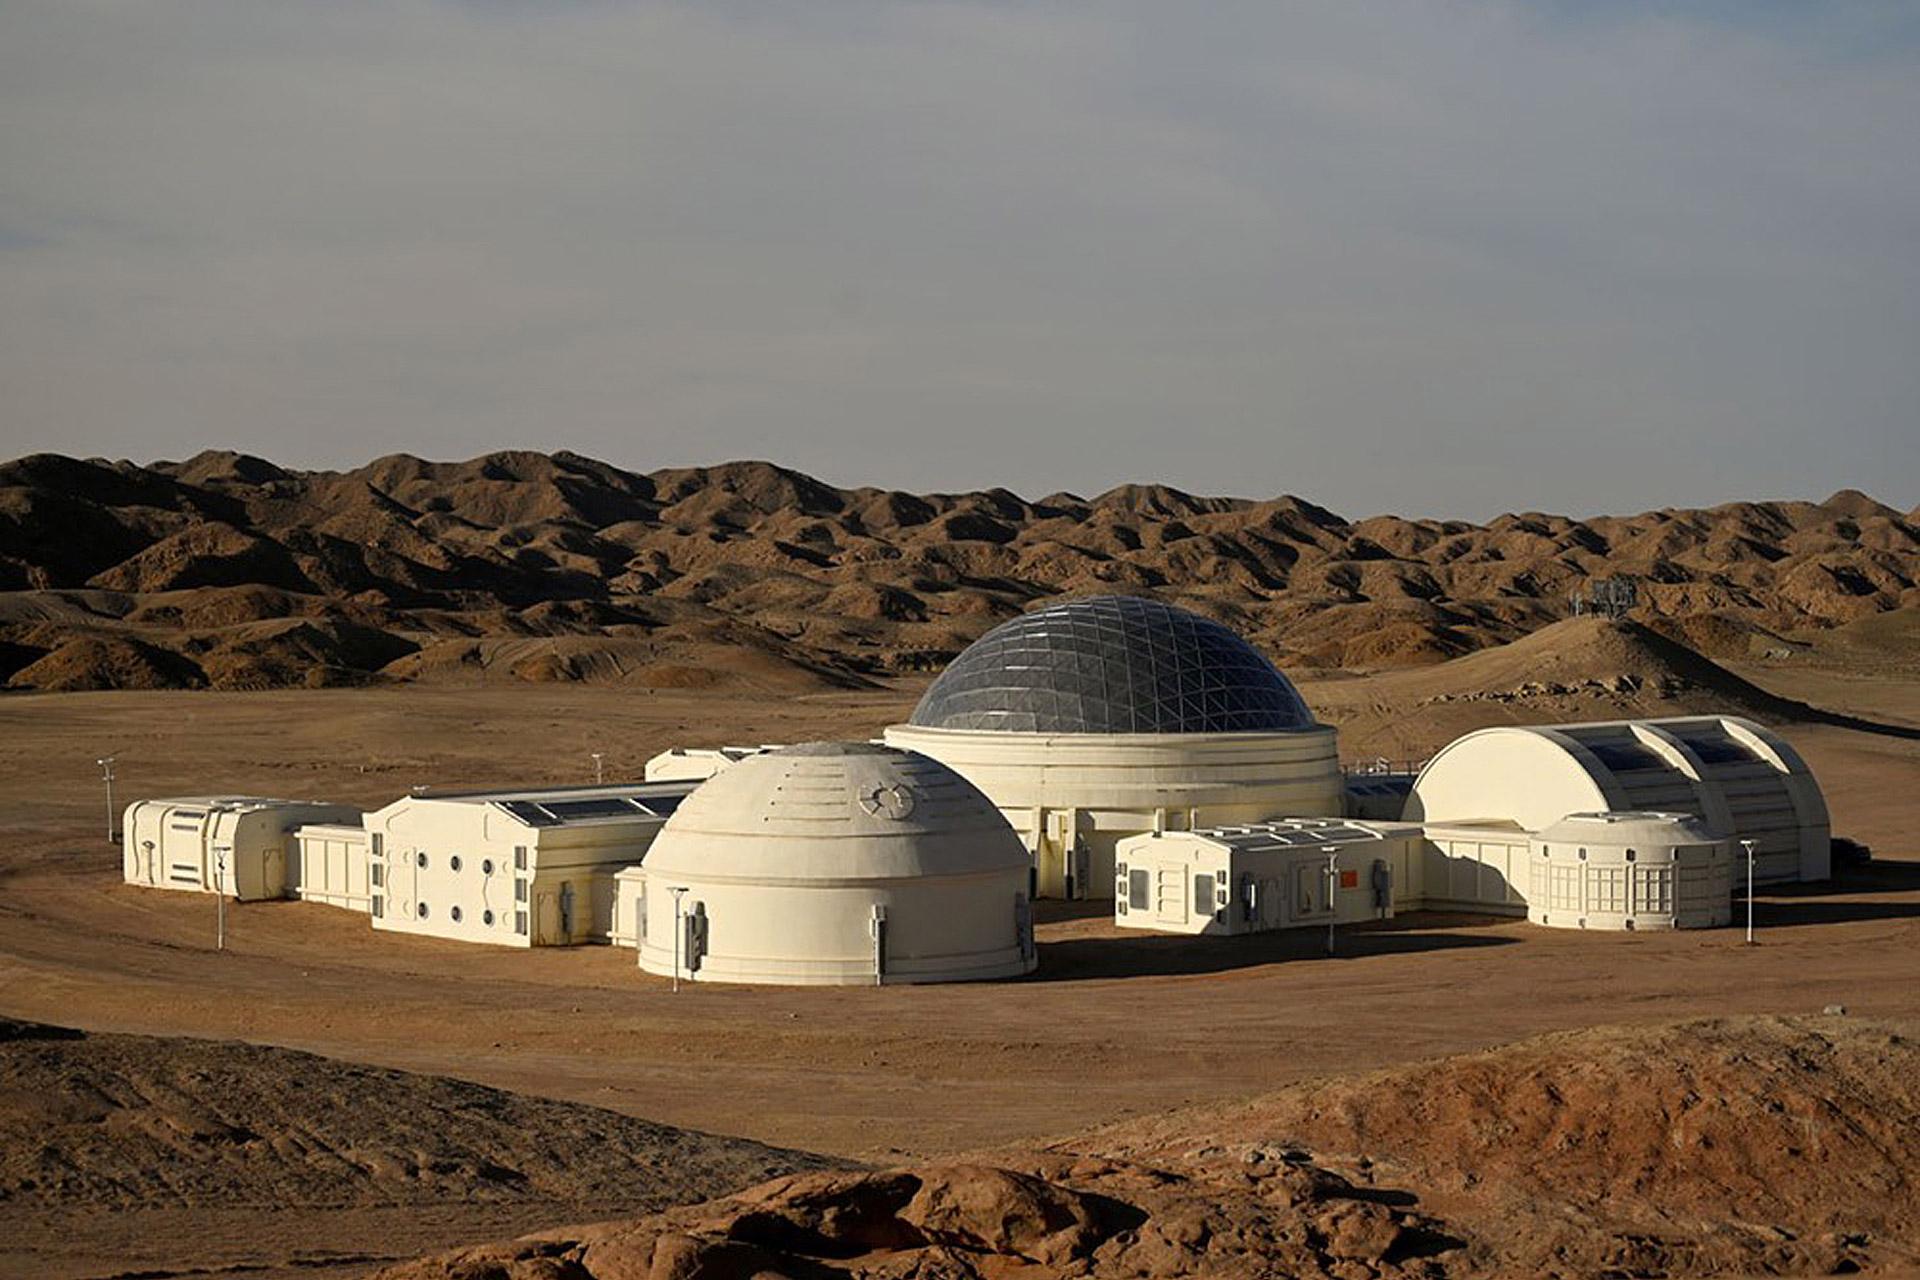 C-Space Mars Base 1